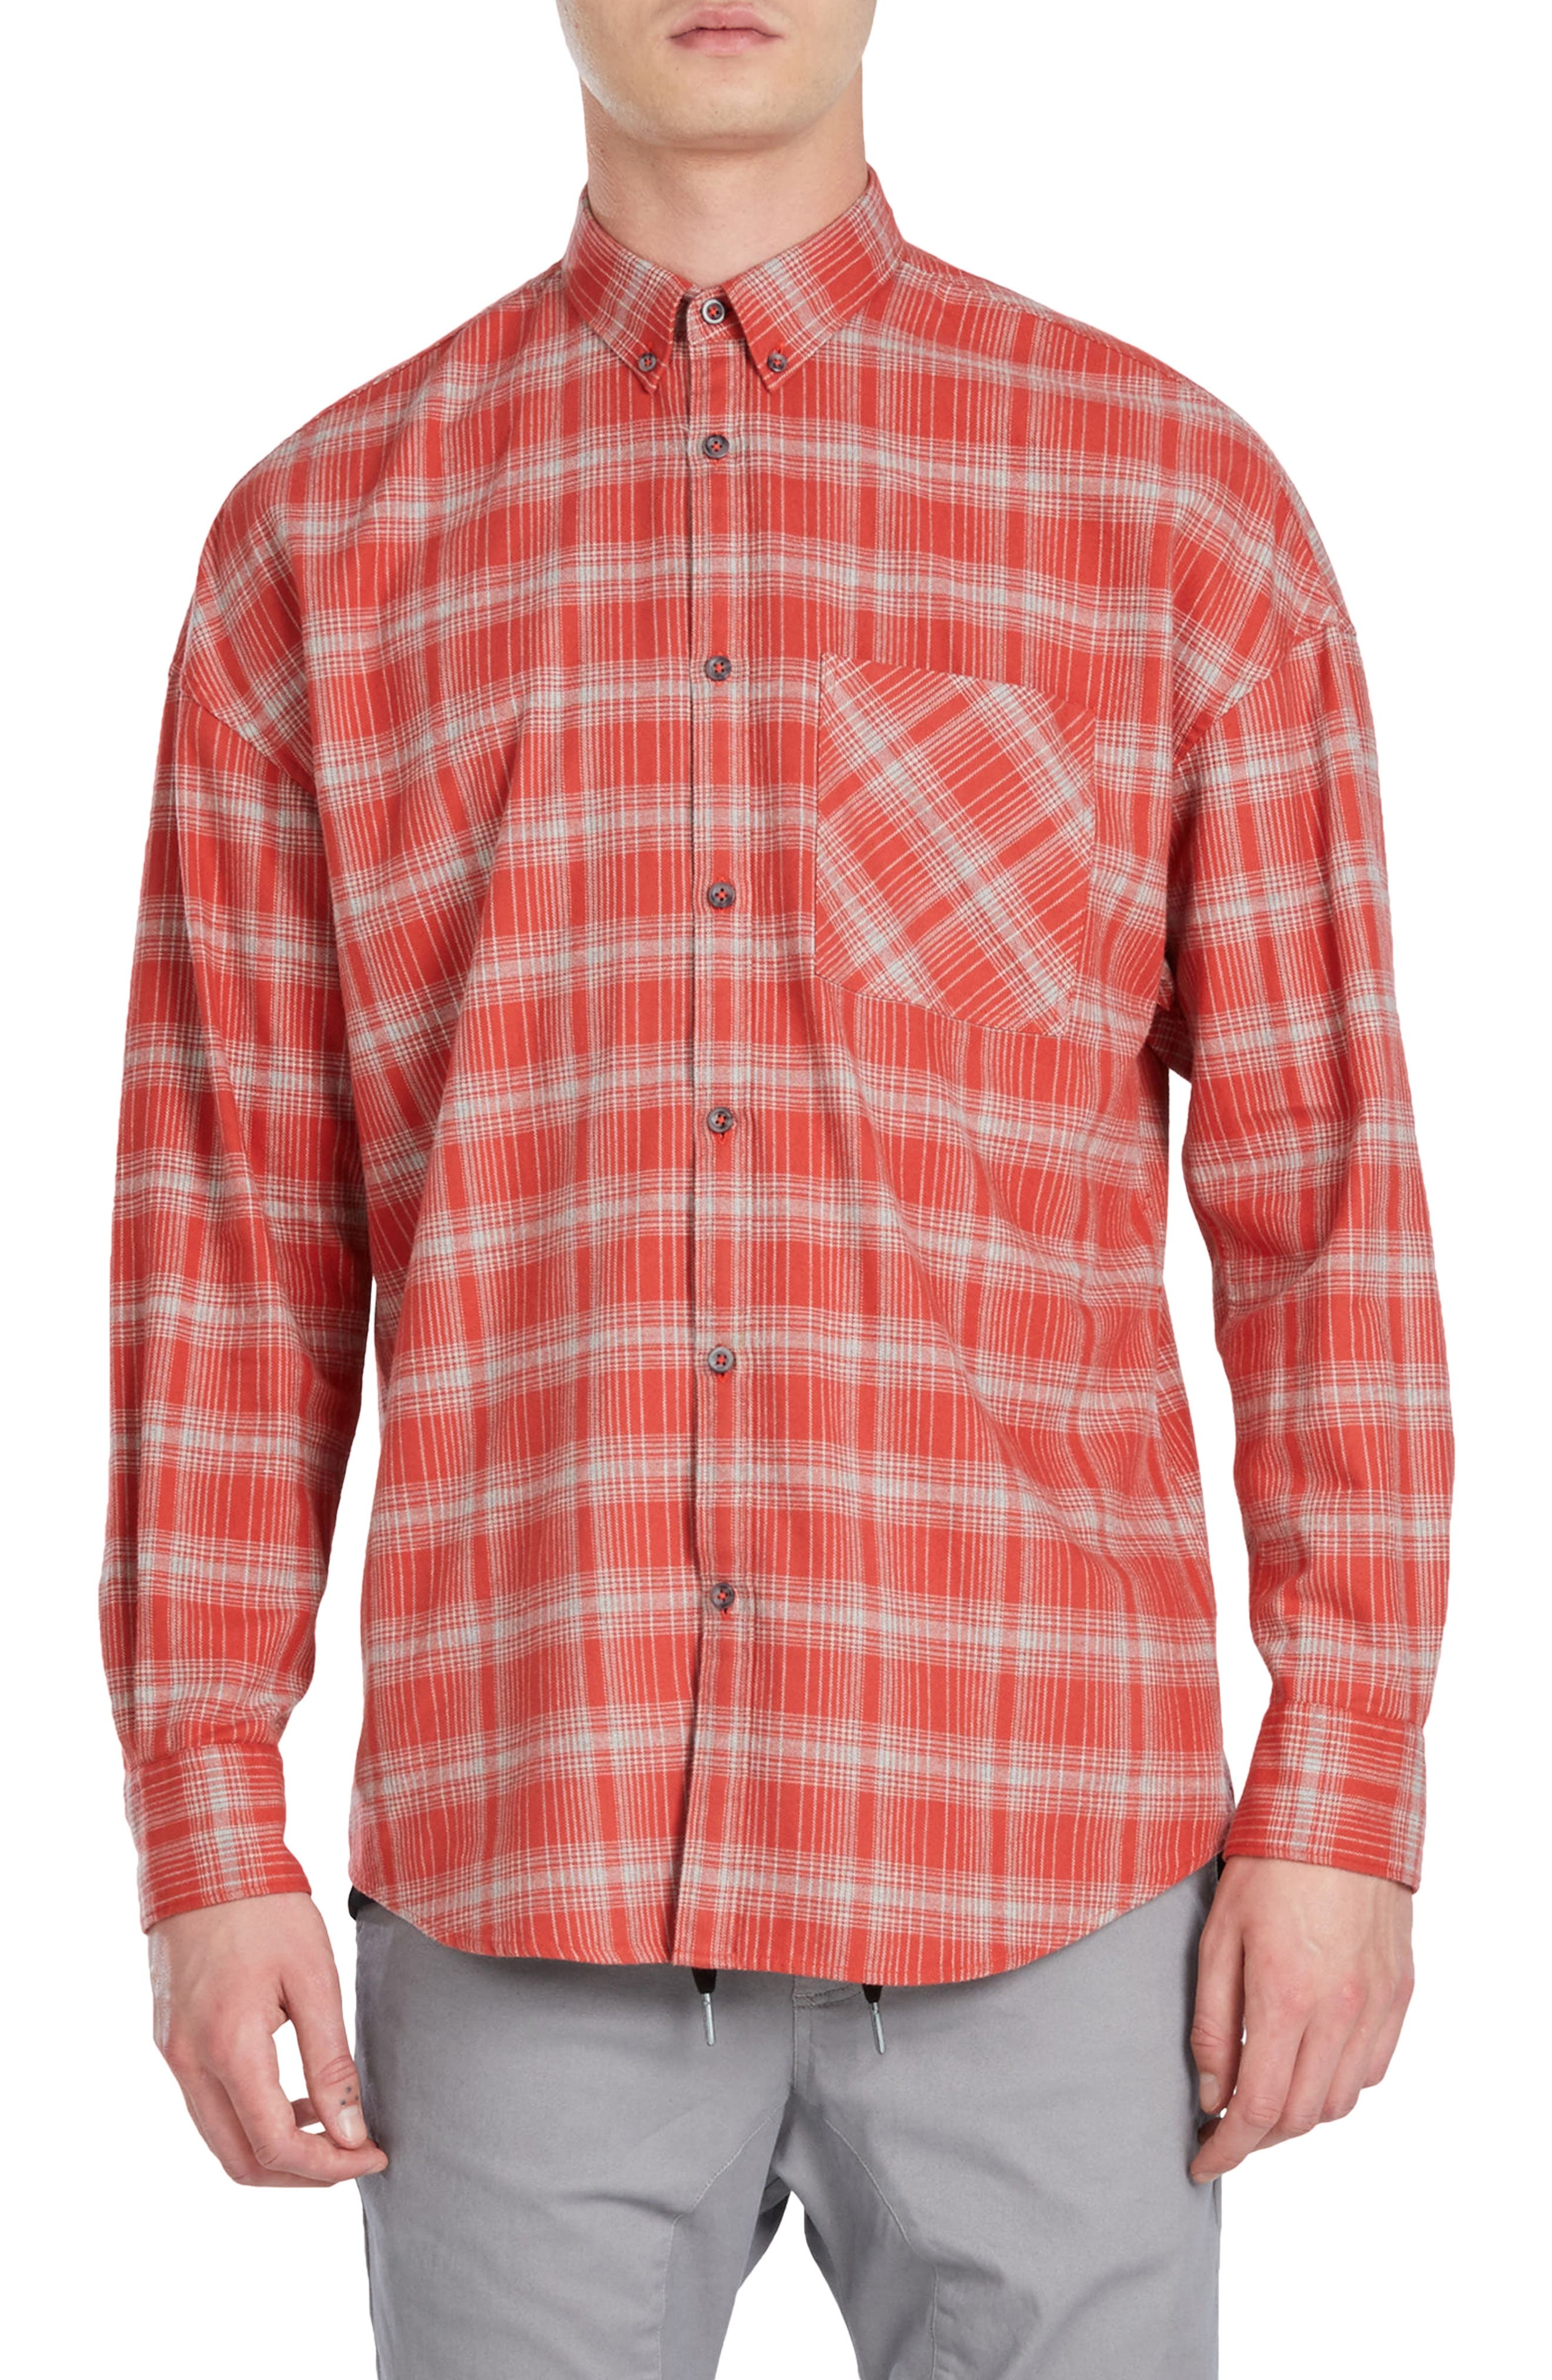 Rugger Plaid Sport Shirt,                         Main,                         color, Vintage Red/ Grey Marled